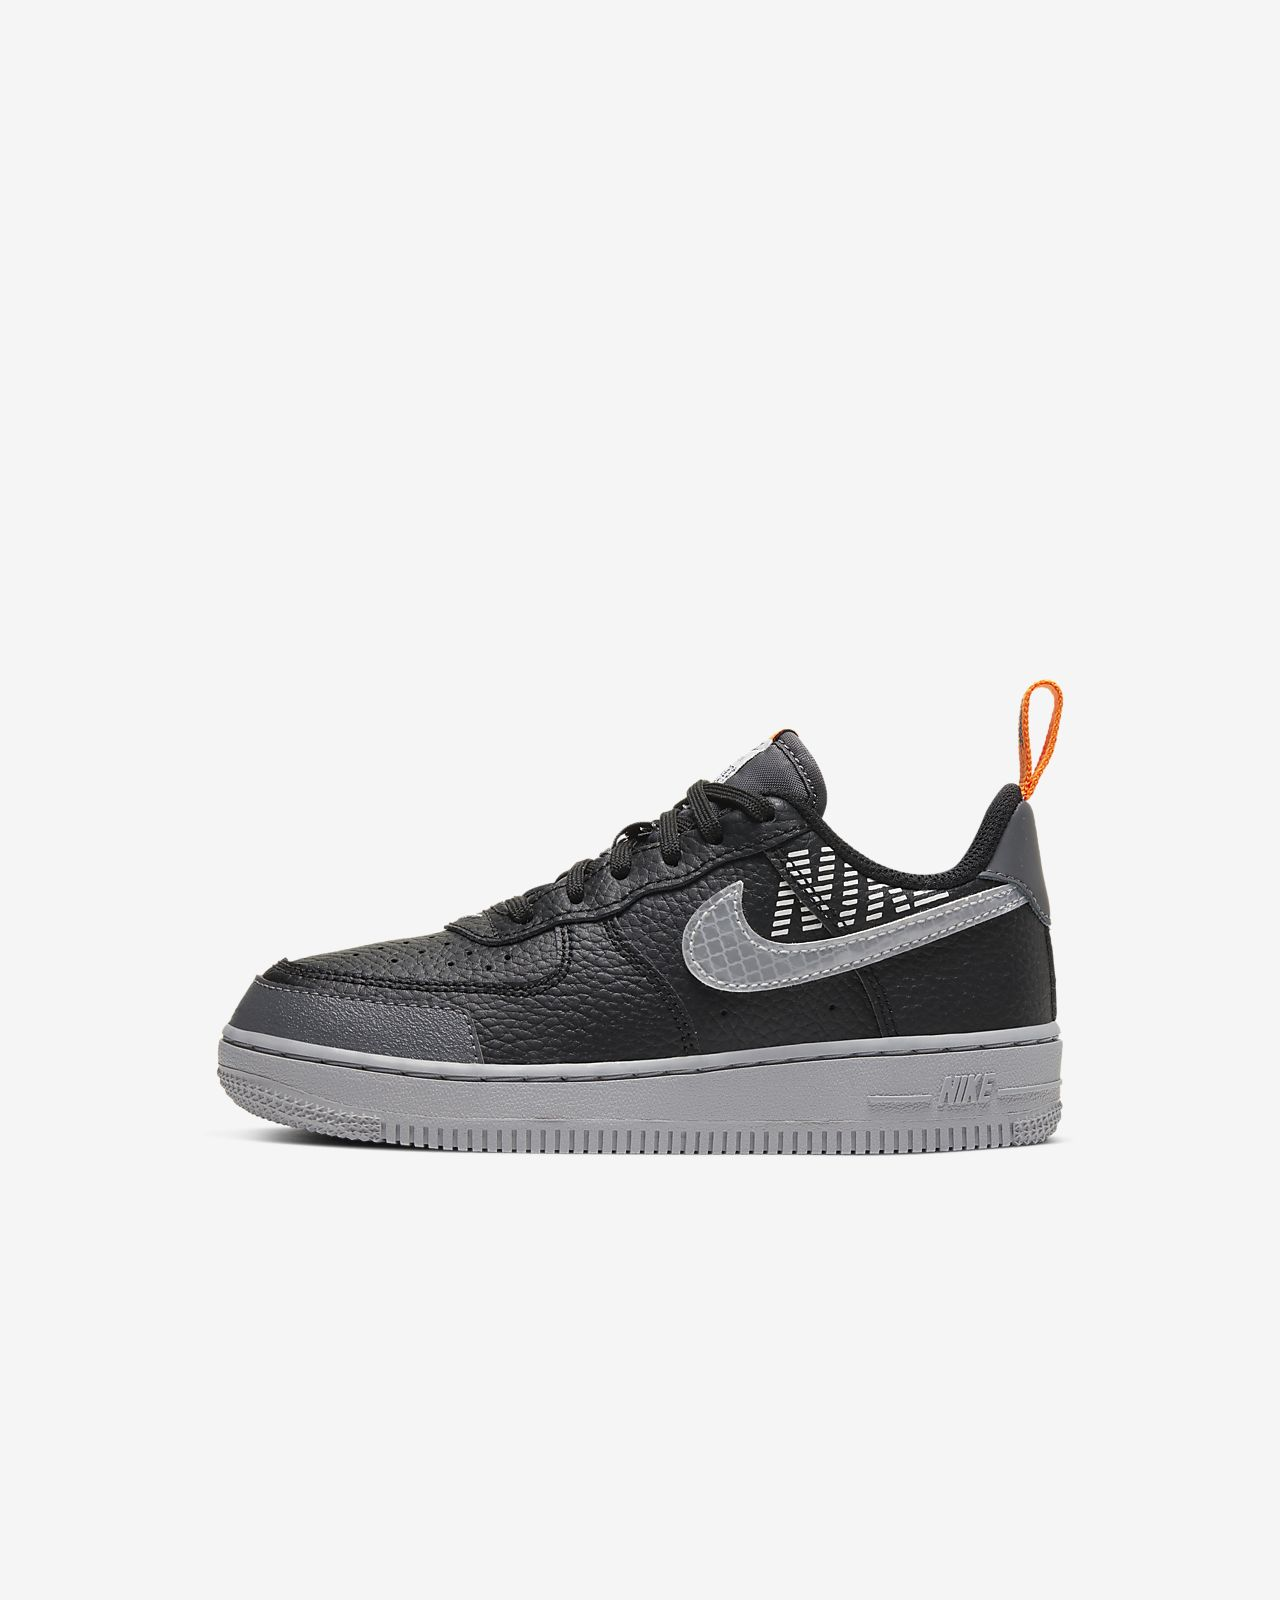 Nike Force 1 LV8 2 (PS) 幼童运动童鞋